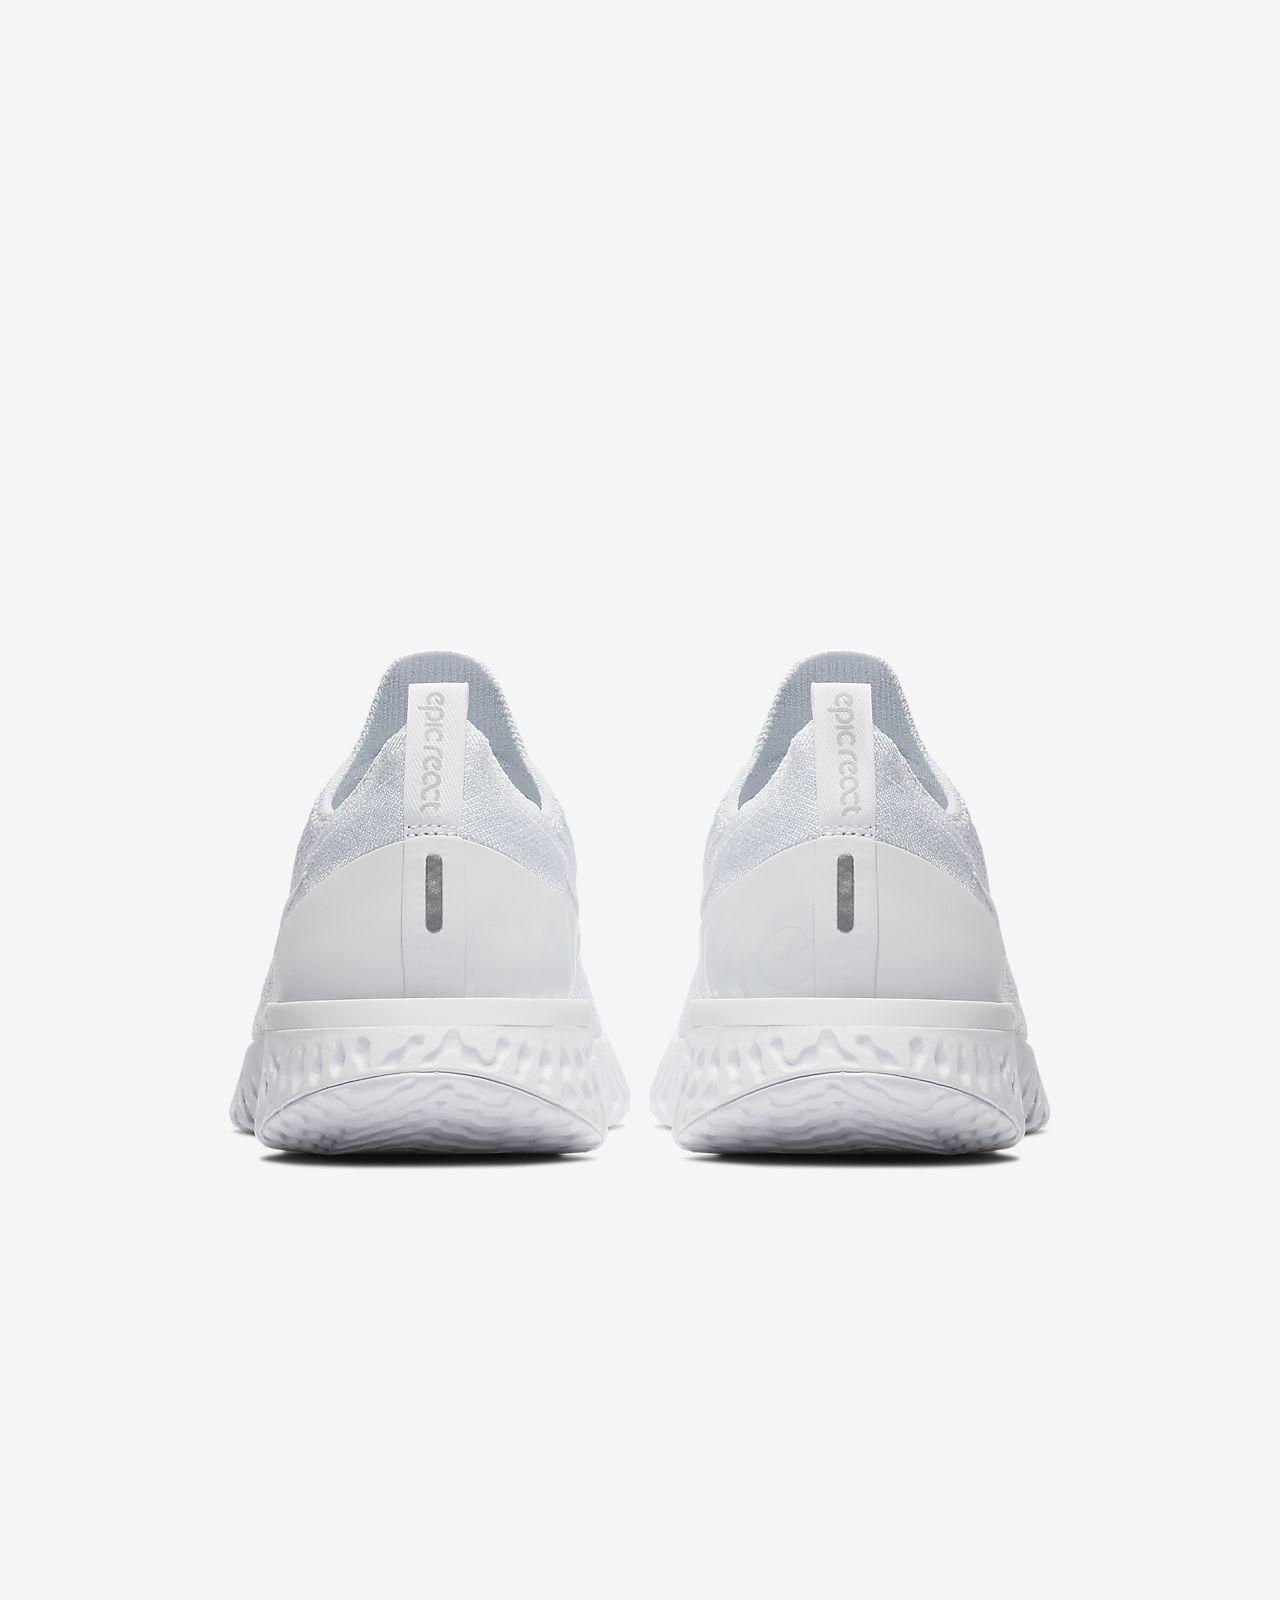 online store 4f201 023af ... Nike Epic React Flyknit Men s Running Shoe